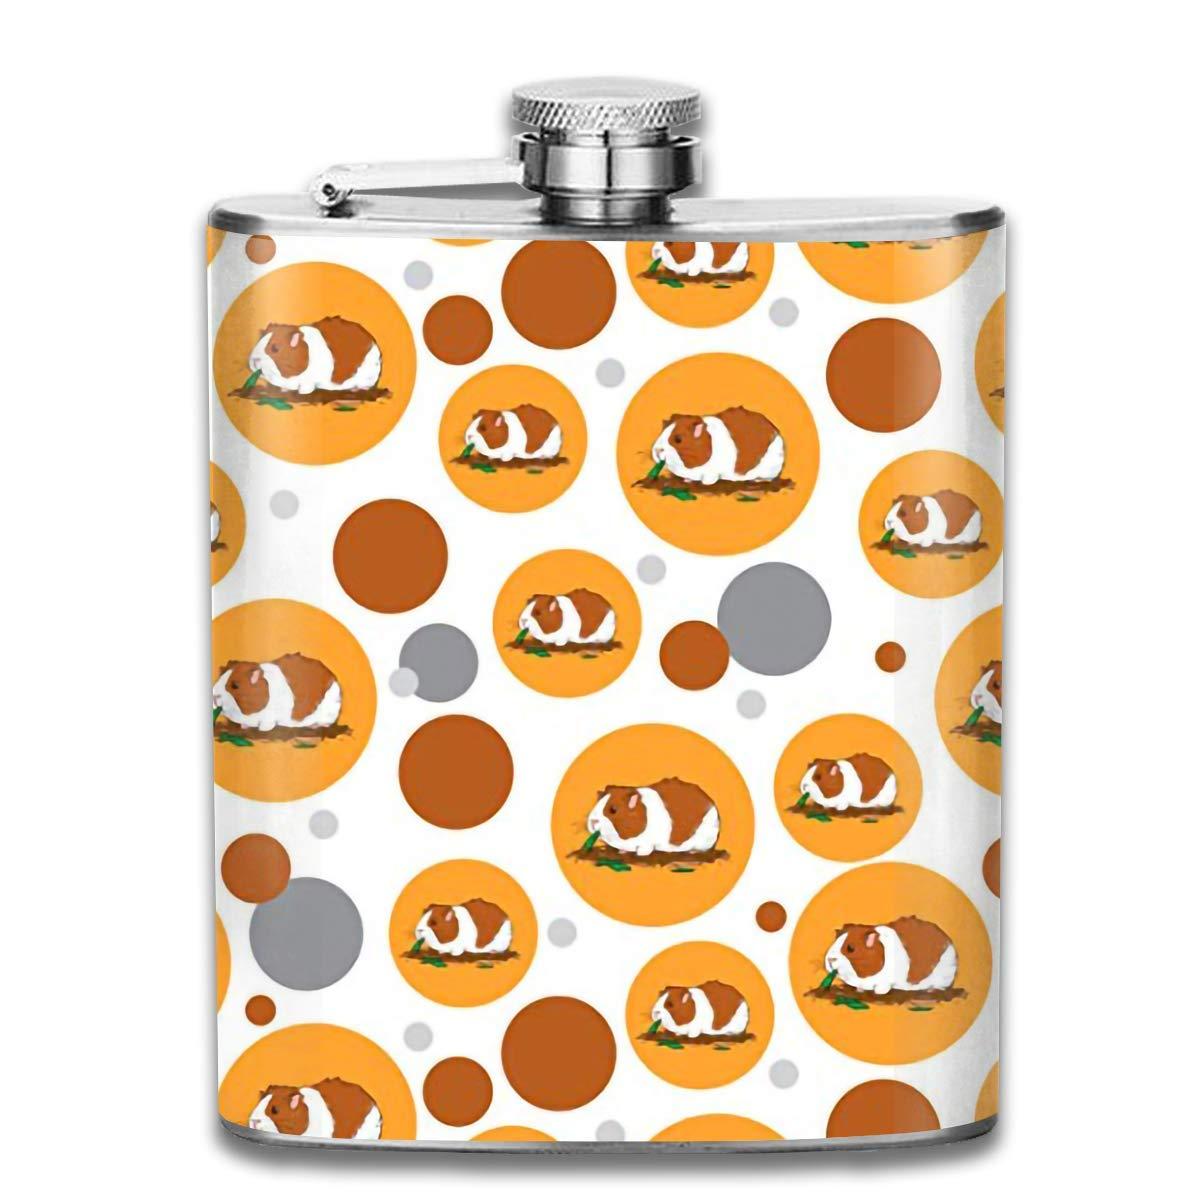 dfegyfr Men and Women Thick Stainless Steel Hip Flask 7 OZ Cute Guinea Pigs Pocket Bottle for Drinking Liquor Whiskey Unisex3